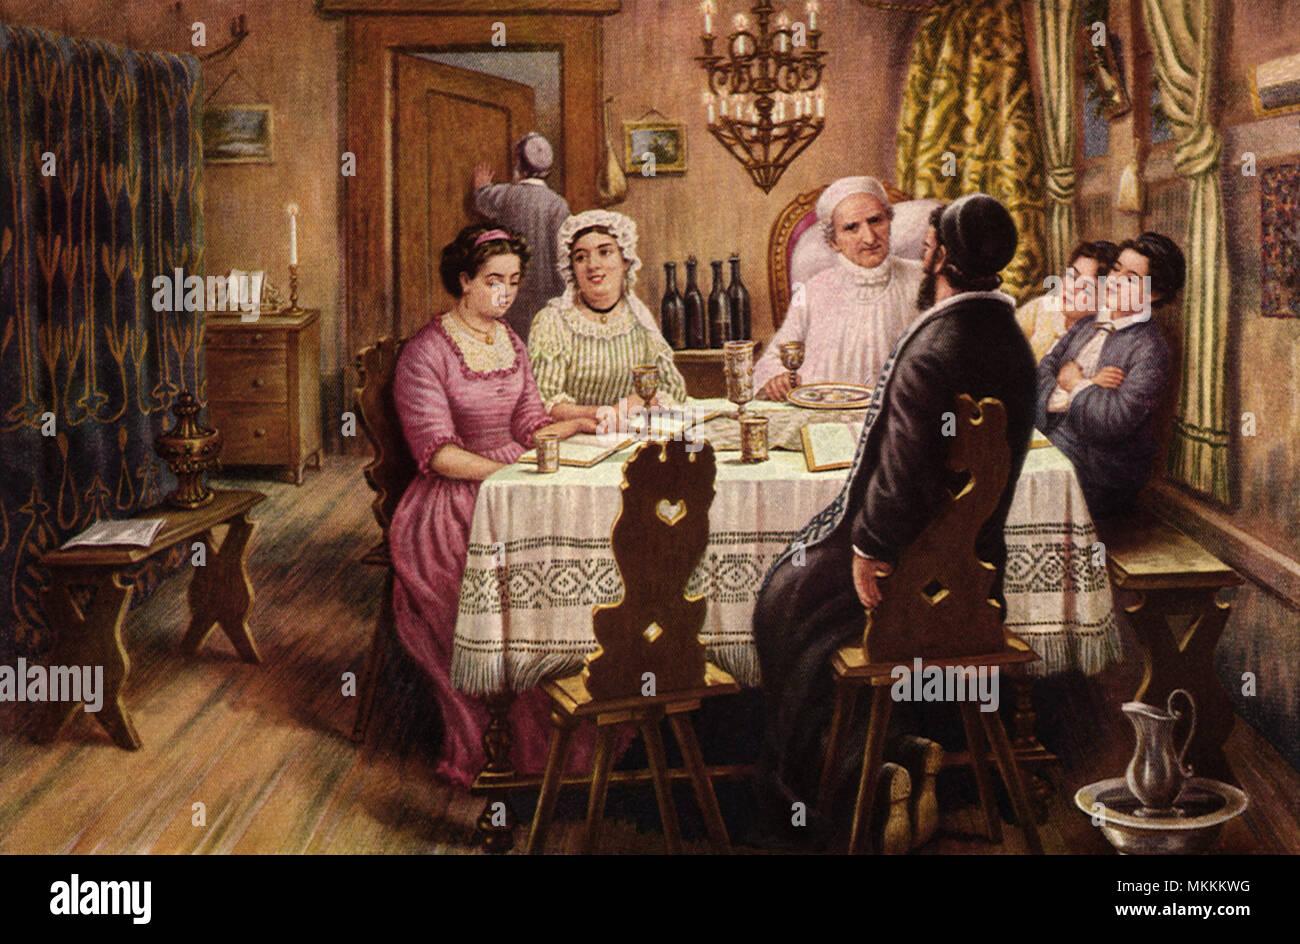 Celebrating the Seder - Stock Image